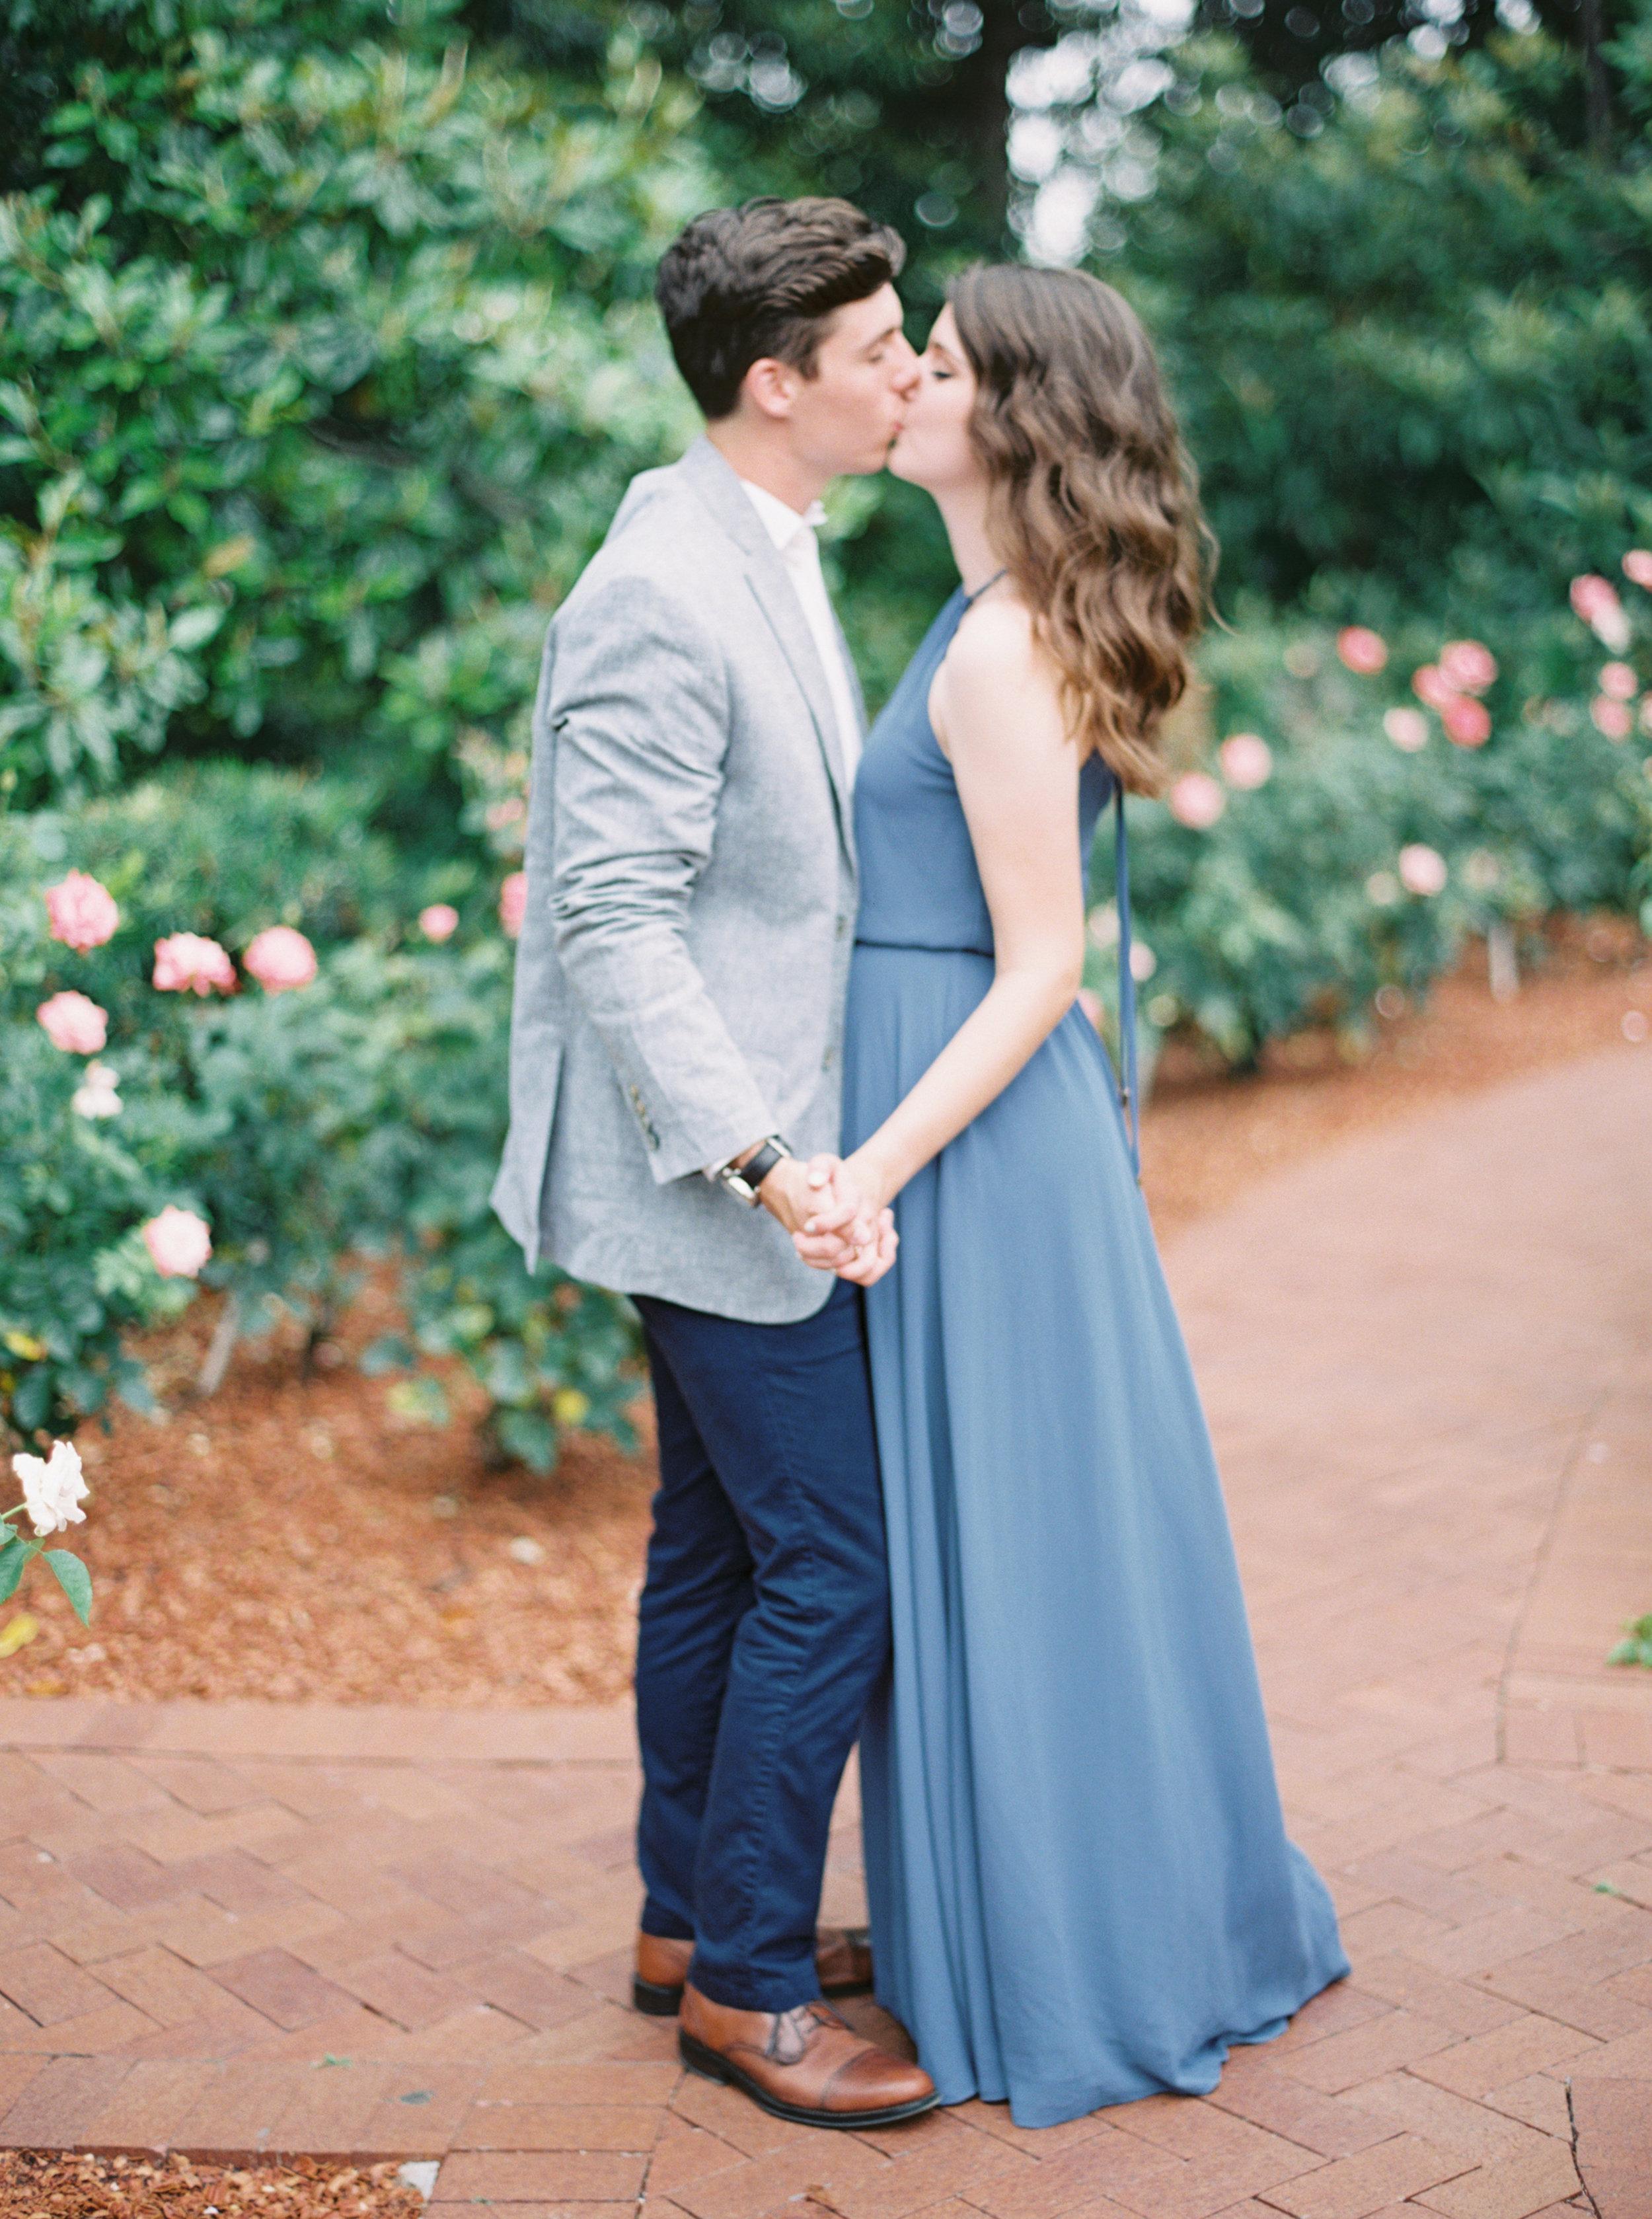 Garden engagement photos by Dallas destination wedding photographer Tracy Enoch